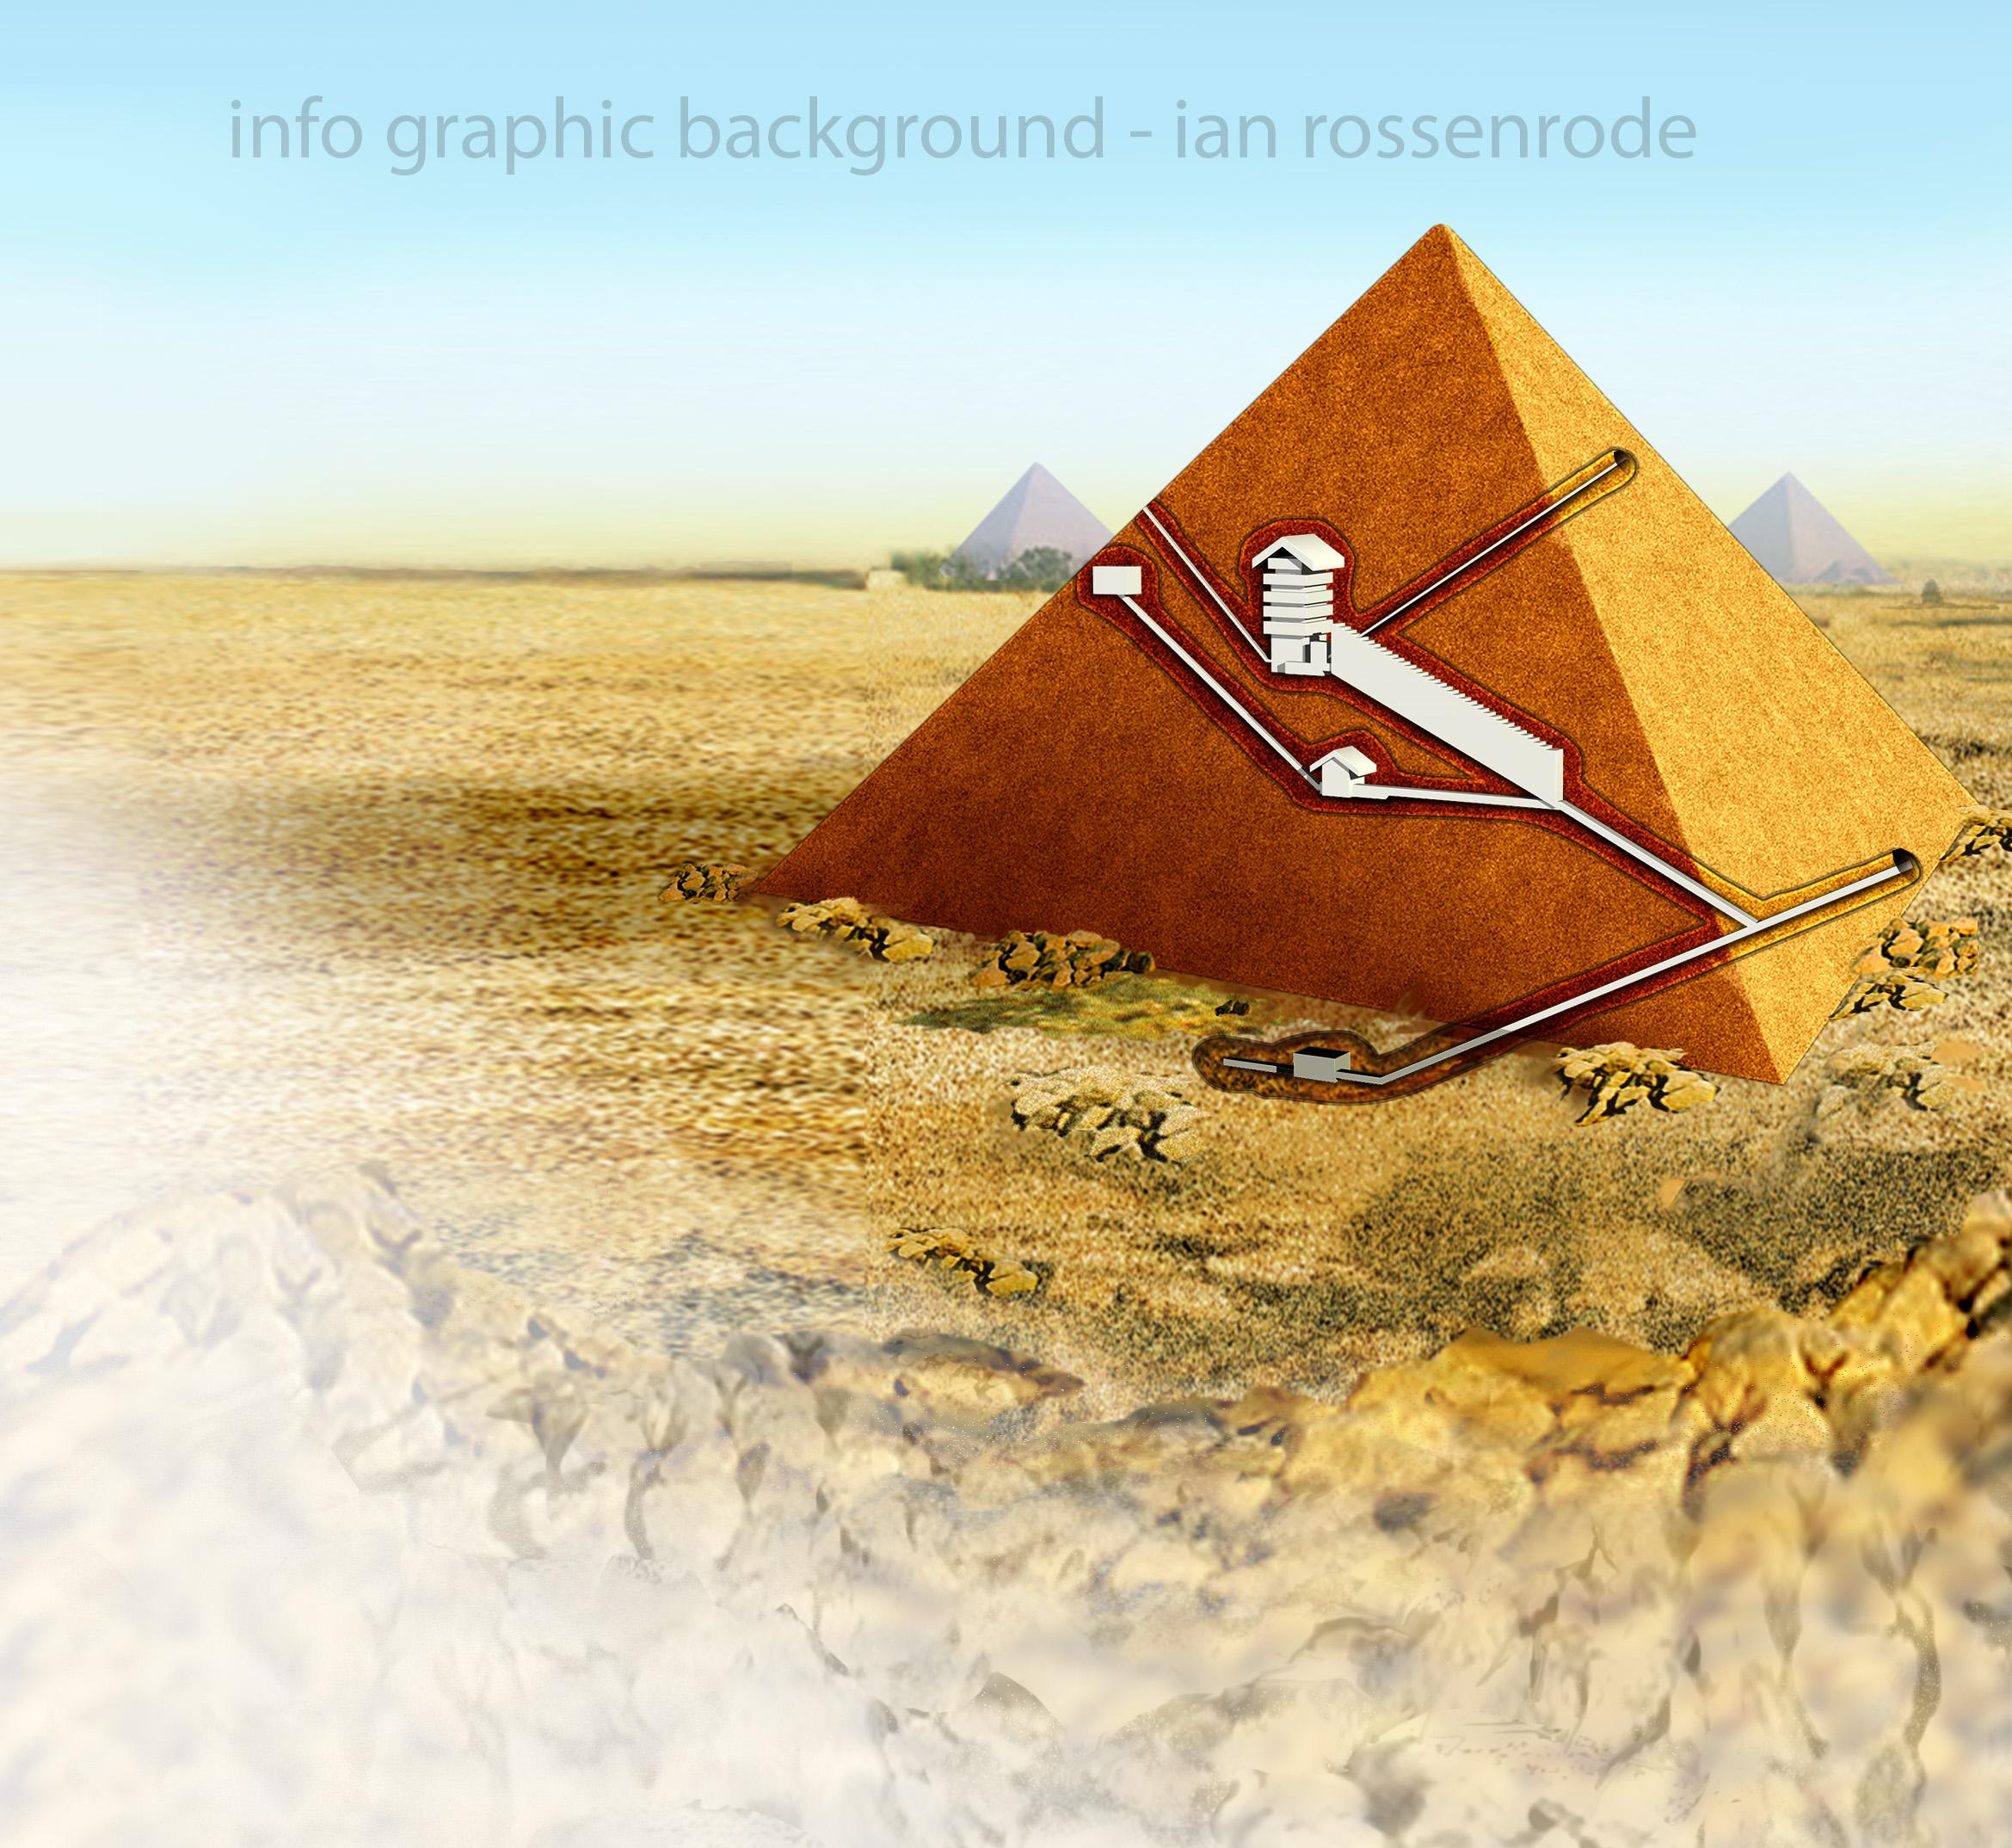 pyramid scene